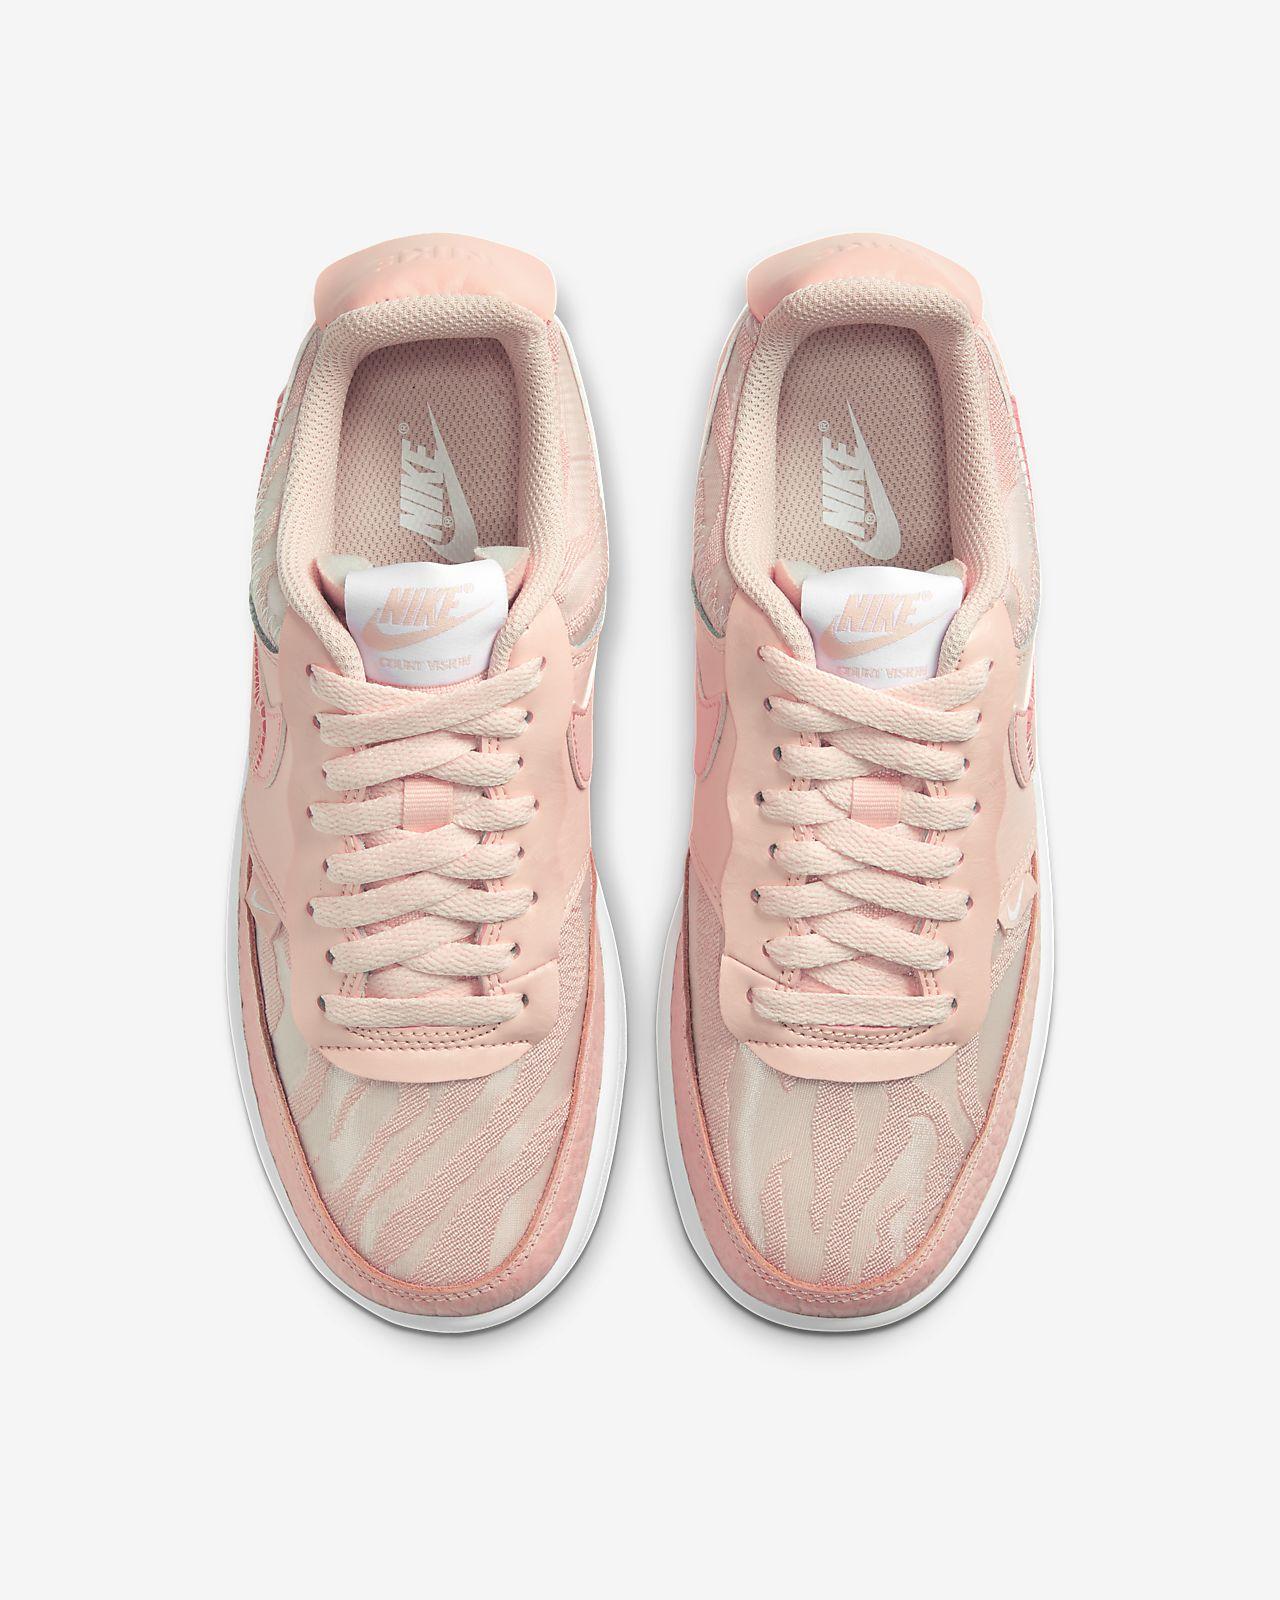 Sko Nike Court Vision Low för kvinnor. Nike SE